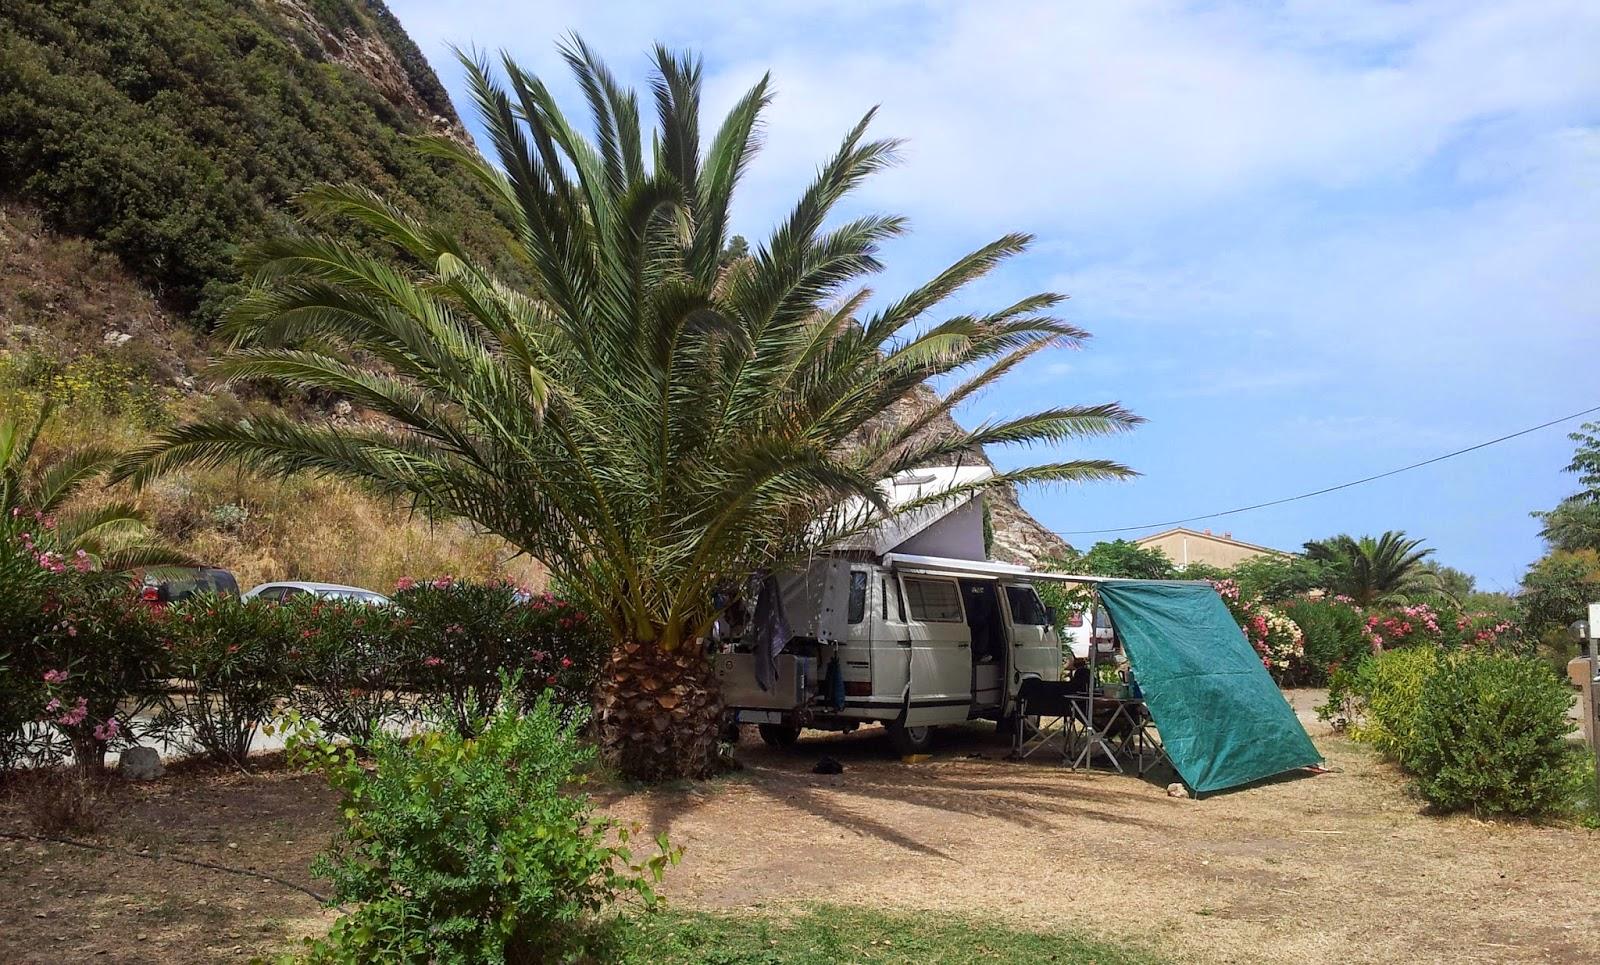 "<img src=""Campingplatz U Sole Marinu.jpg"" alt=""Campinplatz U Sole Marinu auf Korsika Region Cap Corse"">"